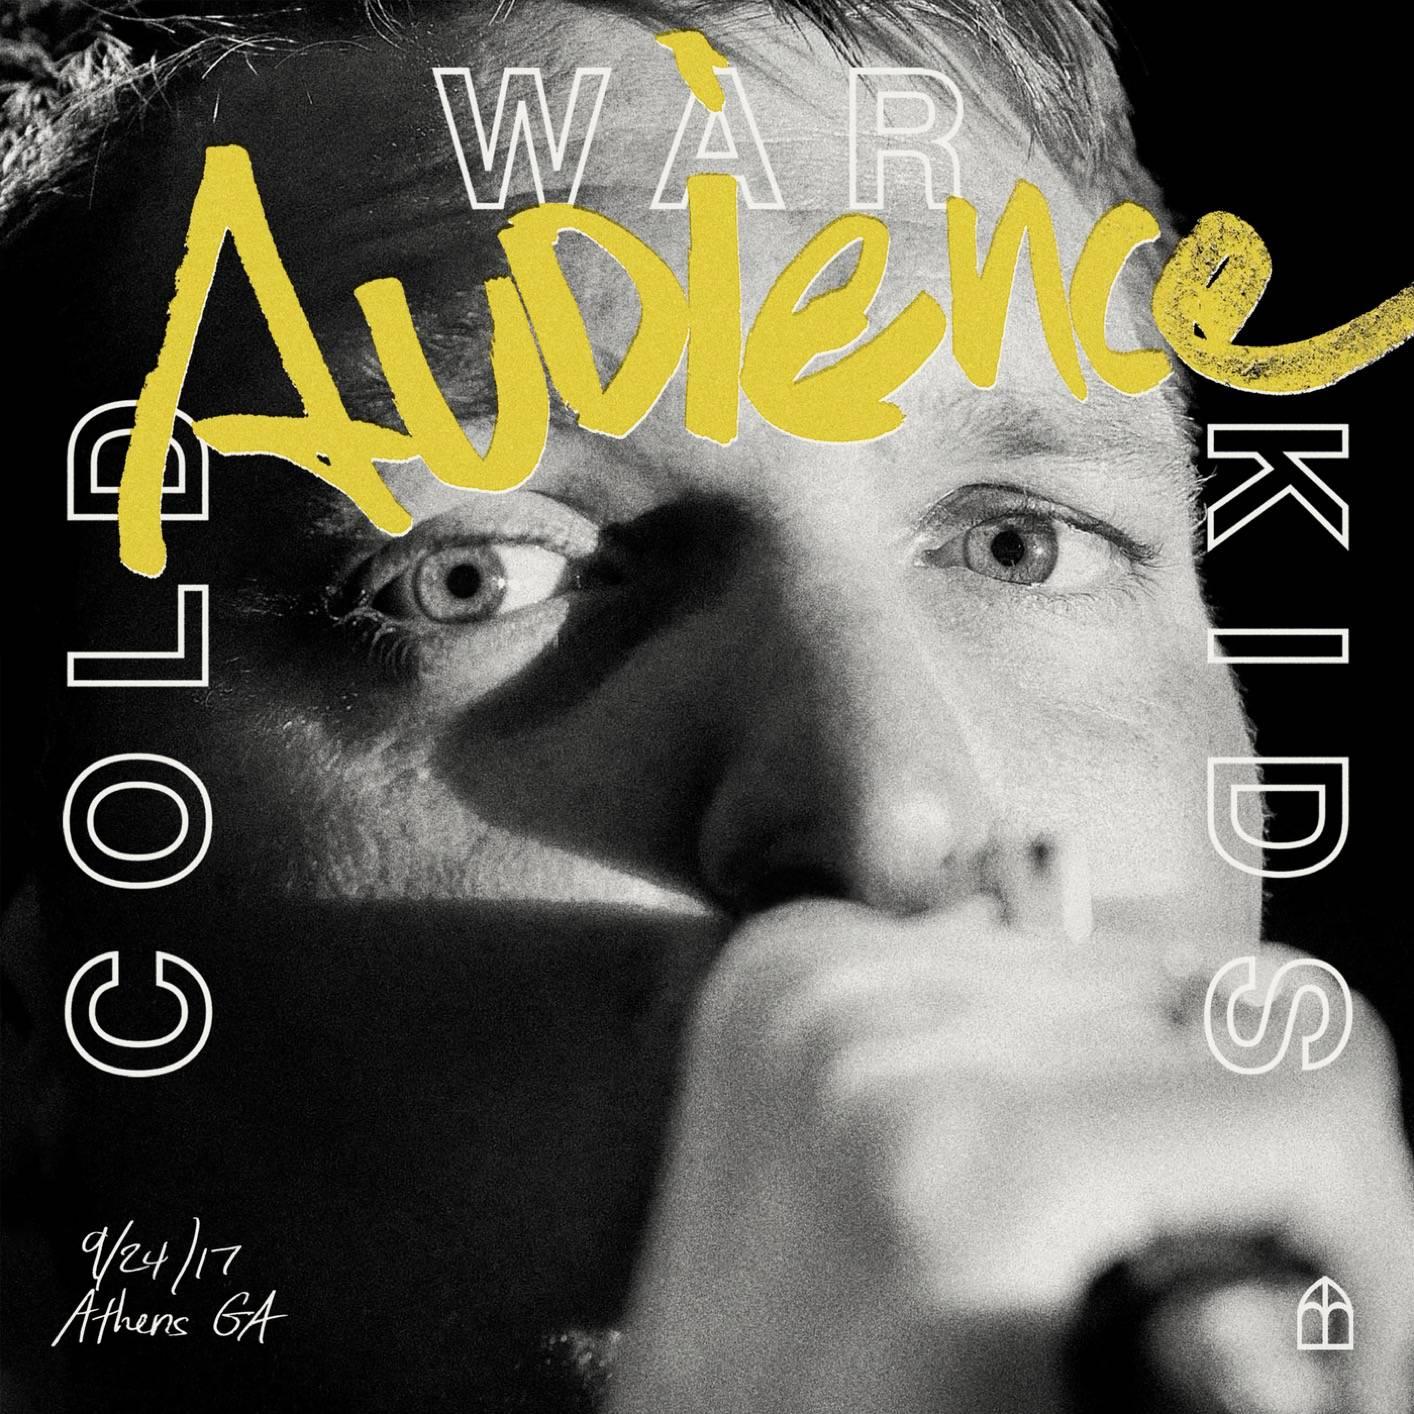 Cold War Kids - Audience (2018) [Official Digital Download]